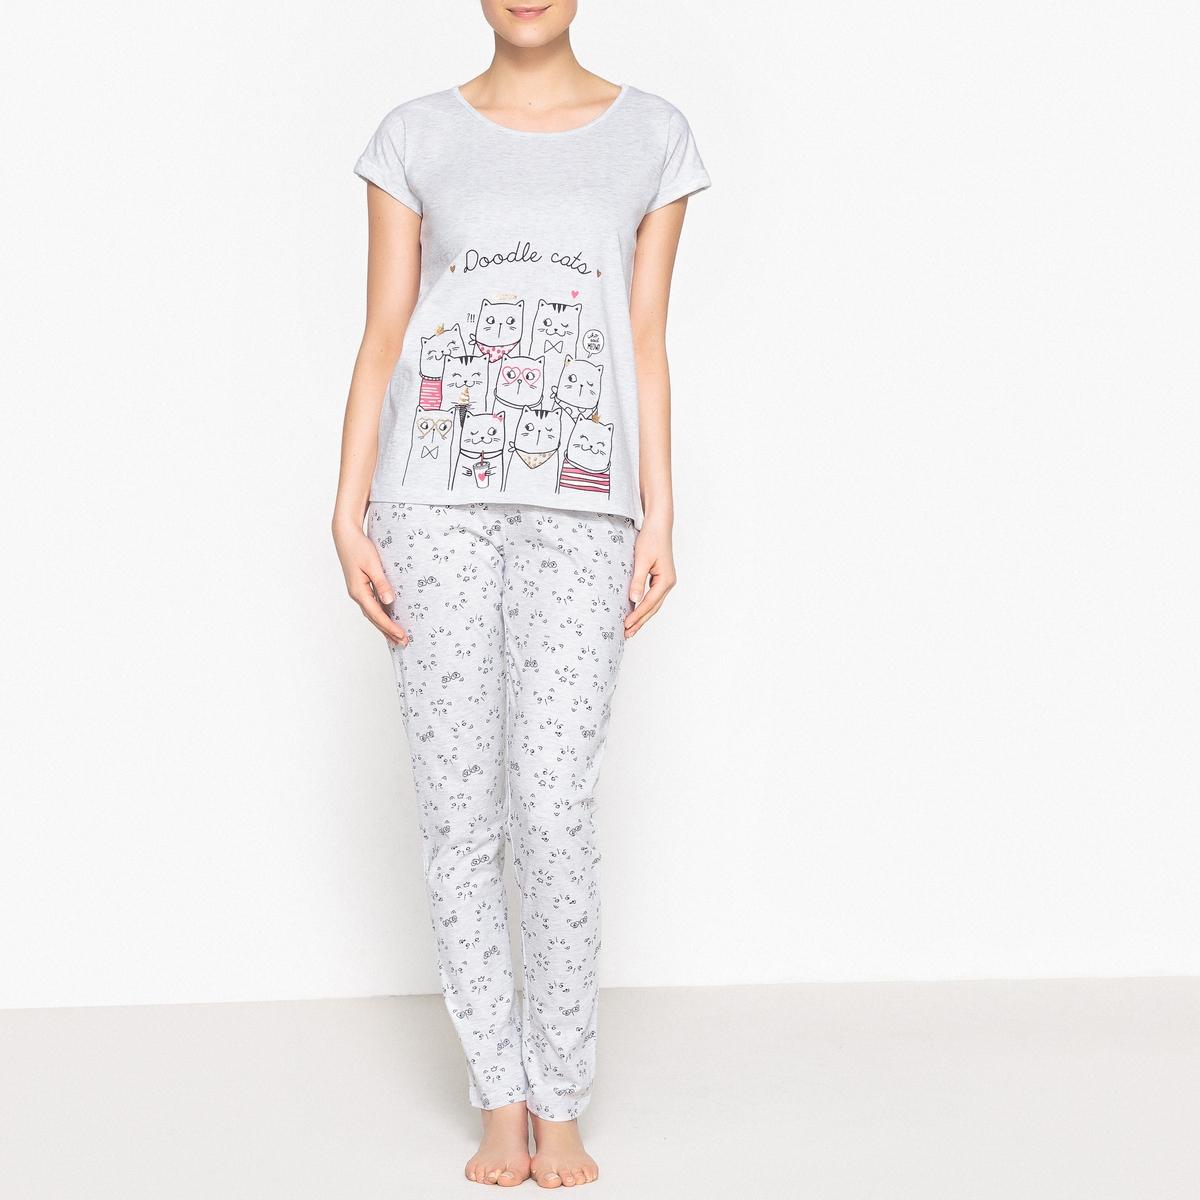 Пижама из хлопка с рисунком кошка пижама с шортами с рисунком